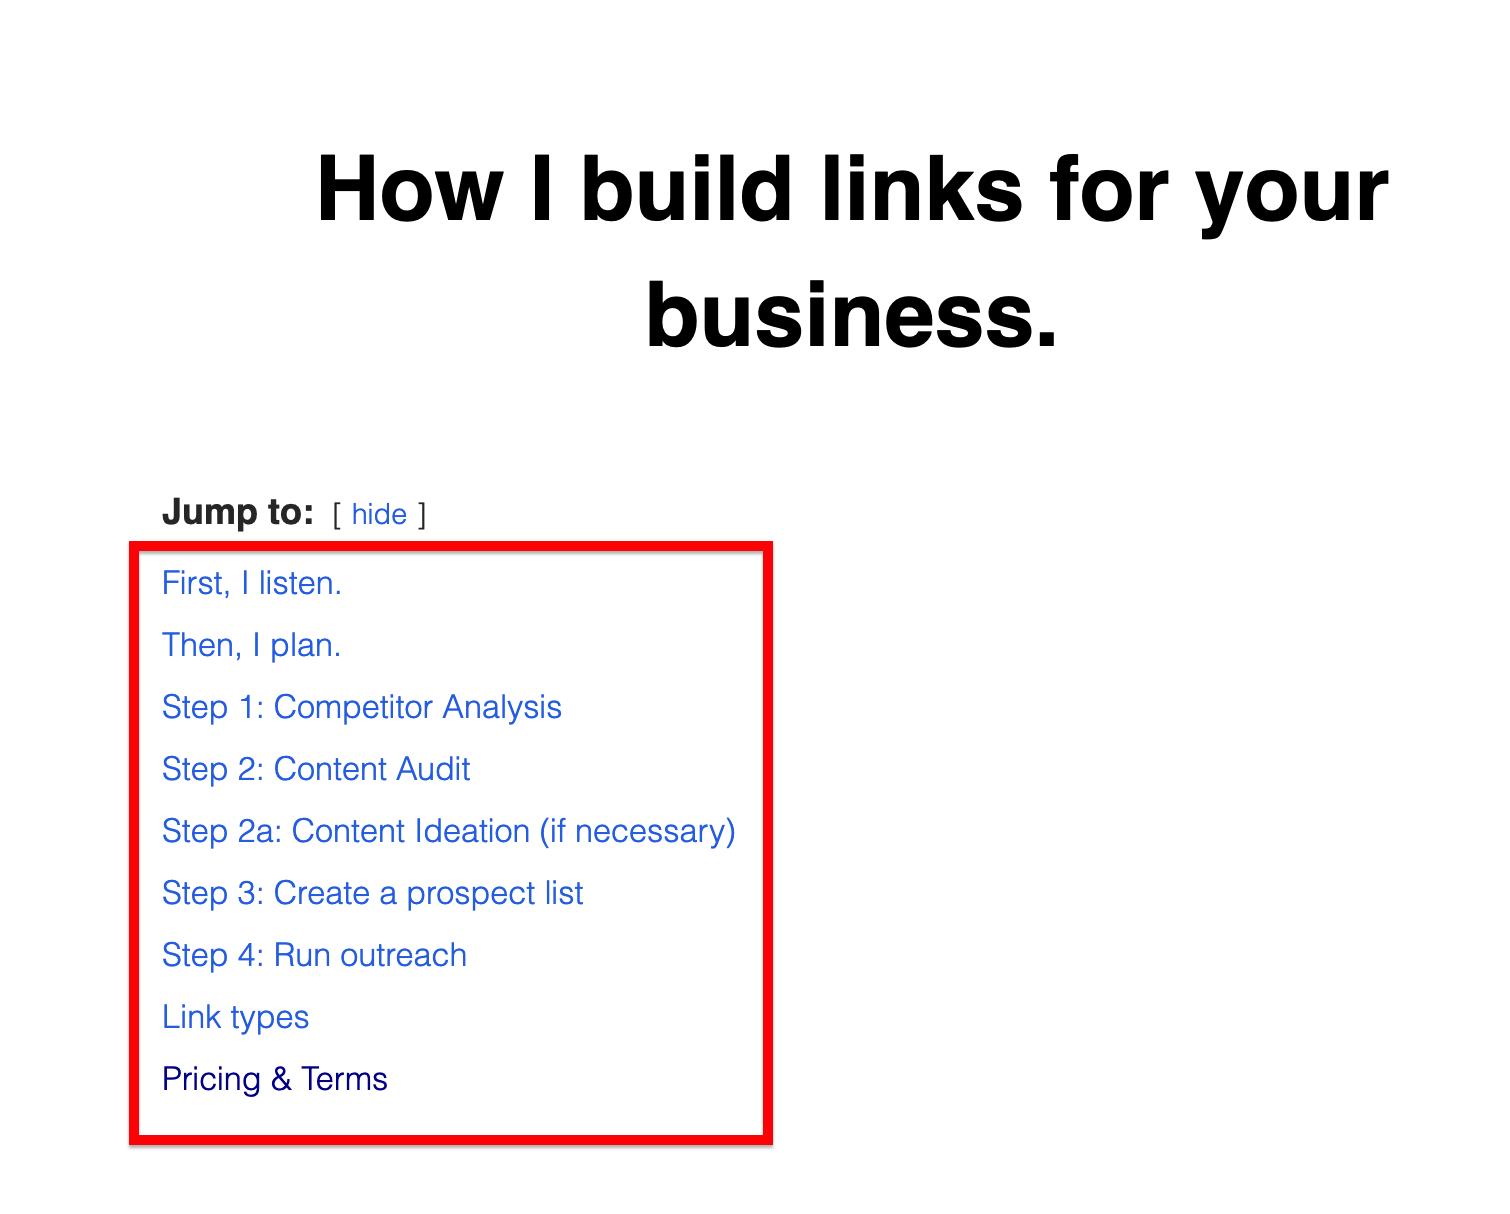 BibiBuzz link building process